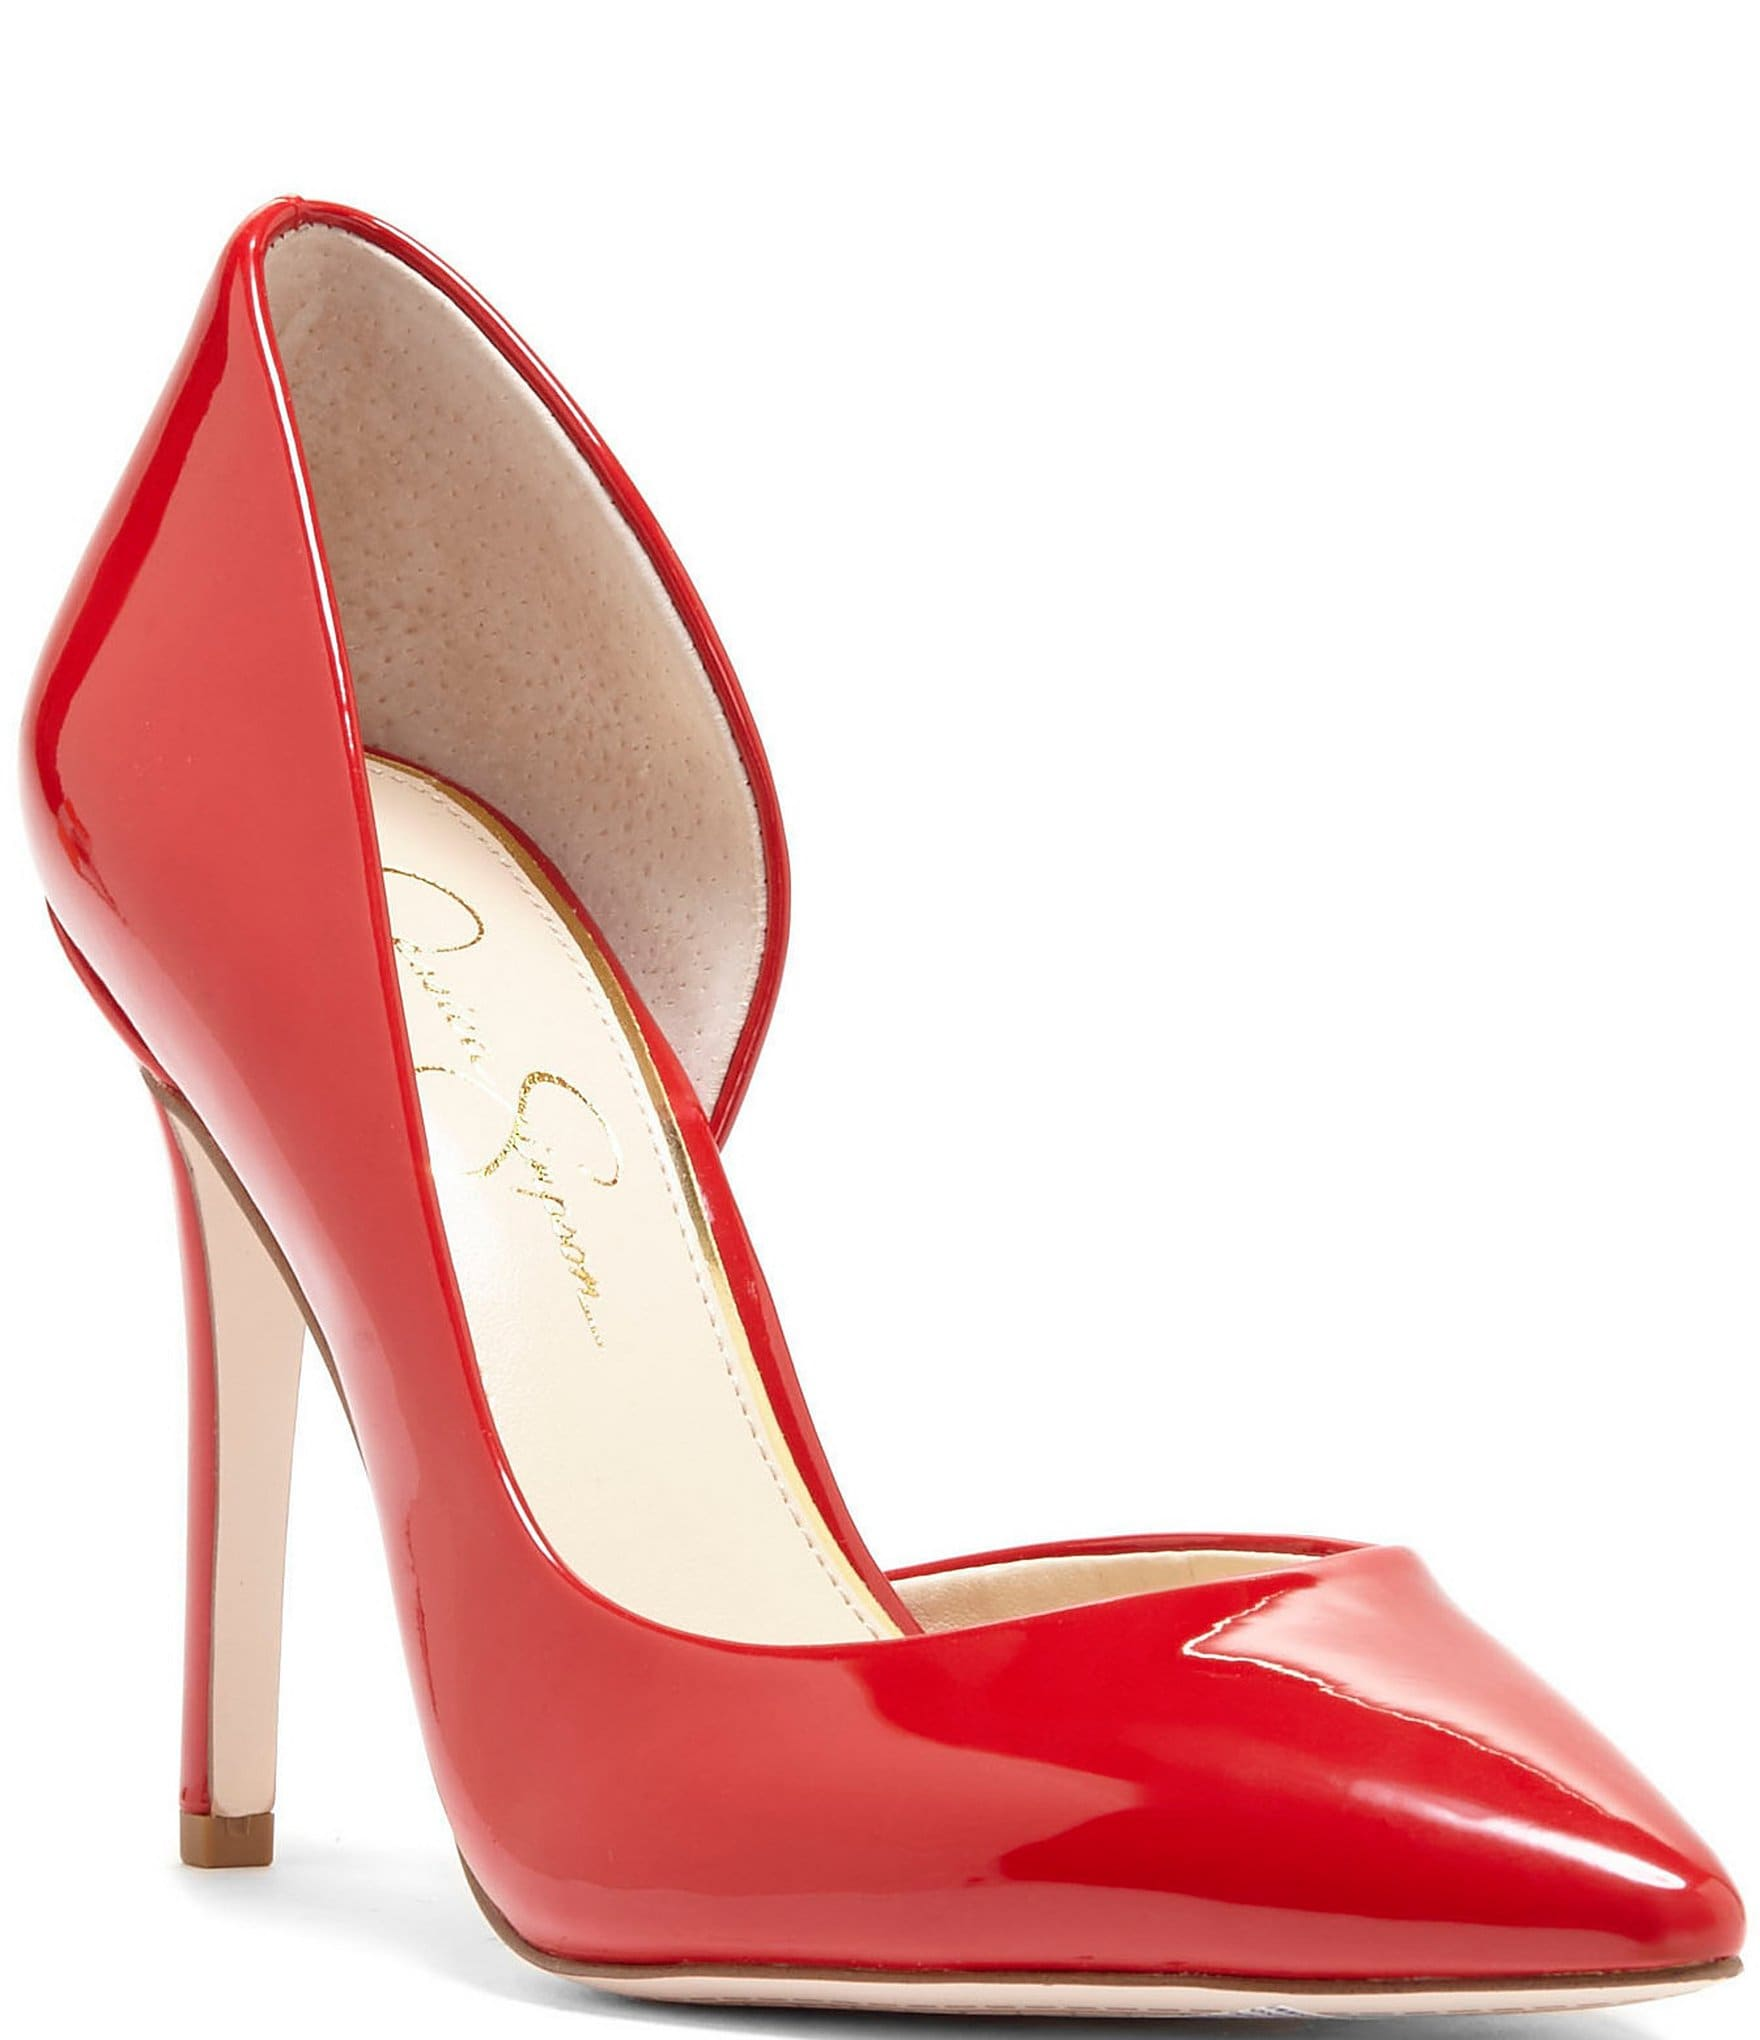 Red Women's Heels | Dillard's